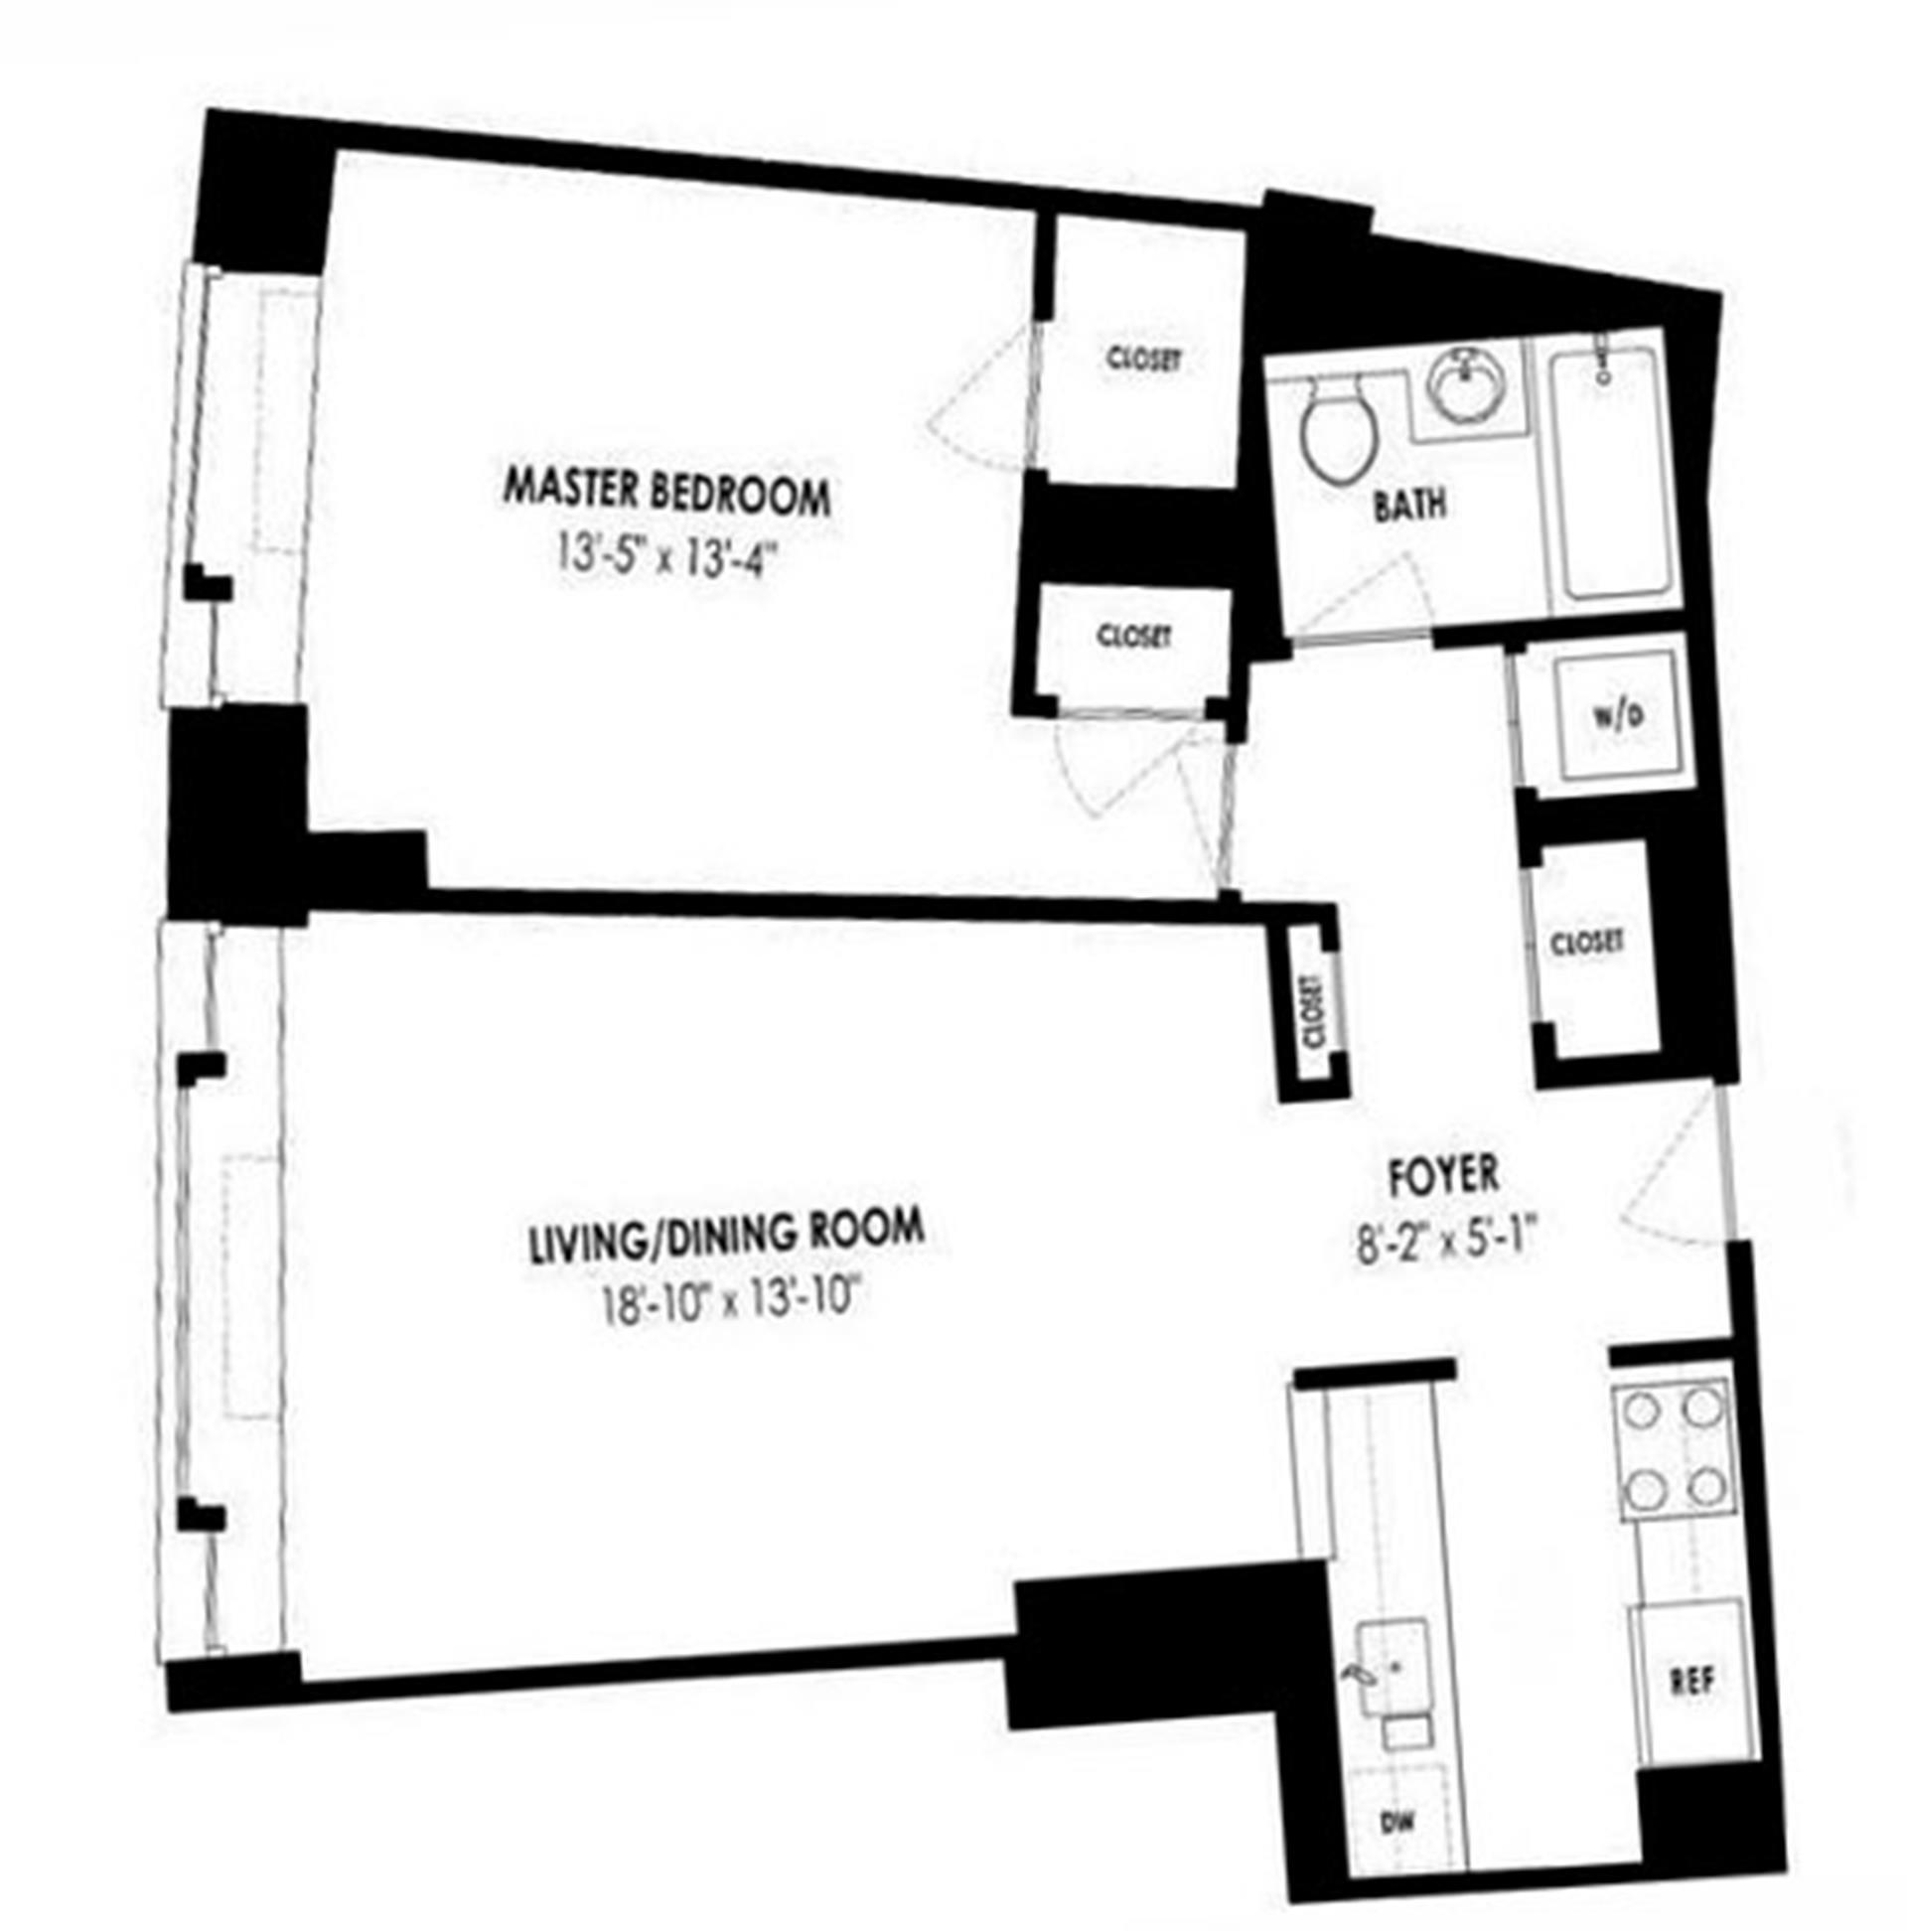 Floor plan of The Heritage, 240 Riverside Boulevard, 4F - Upper West Side, New York